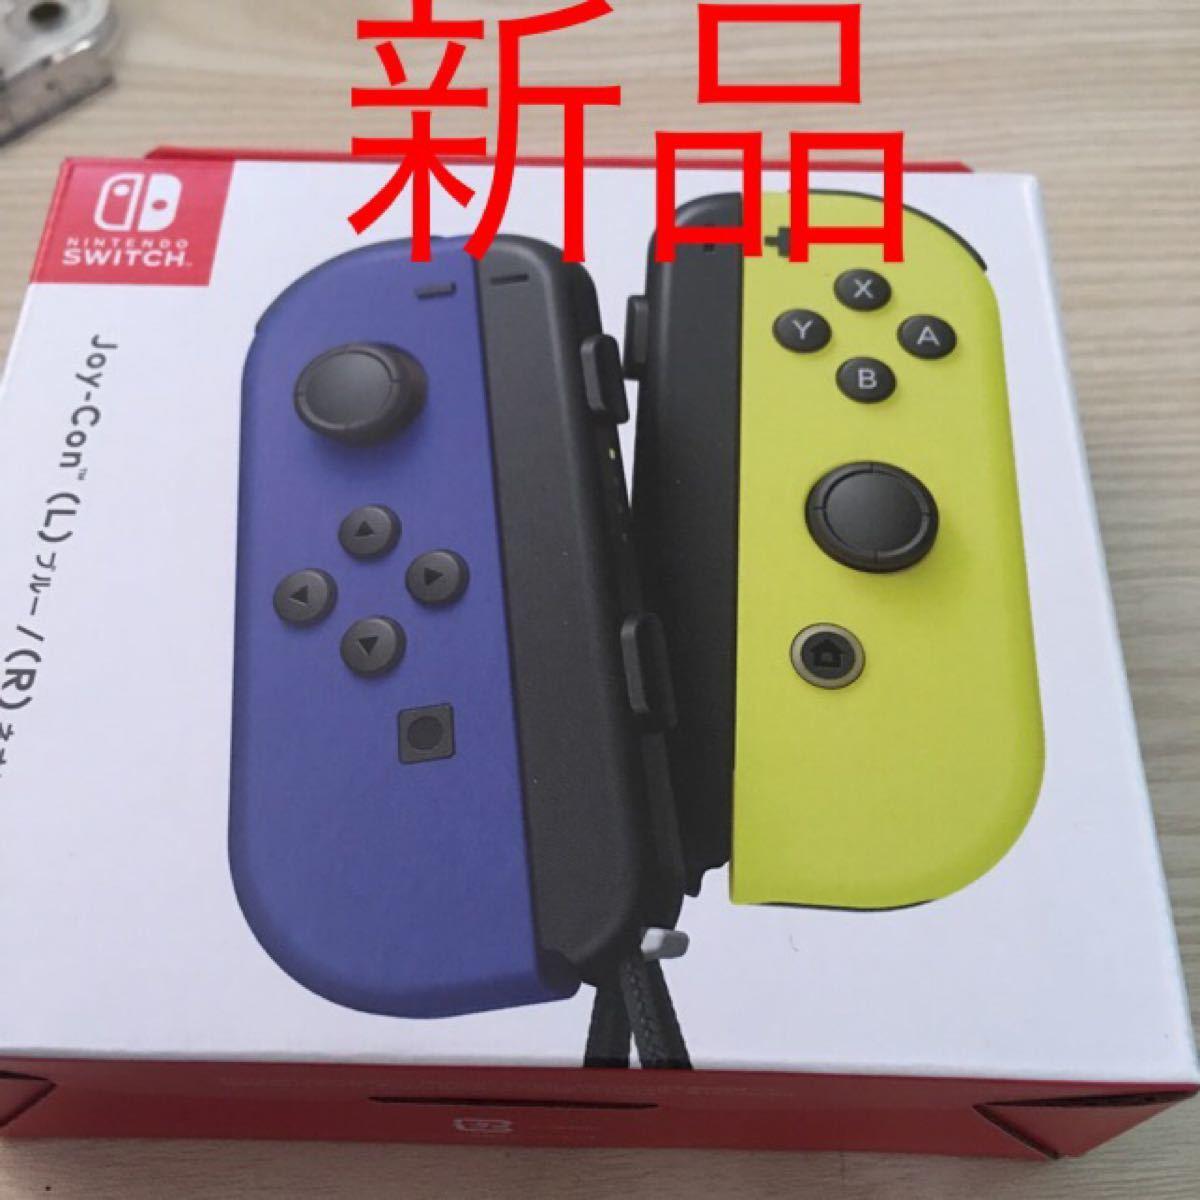 Nintendo Switch ジョイコン Joy-Con ブルー イエロー